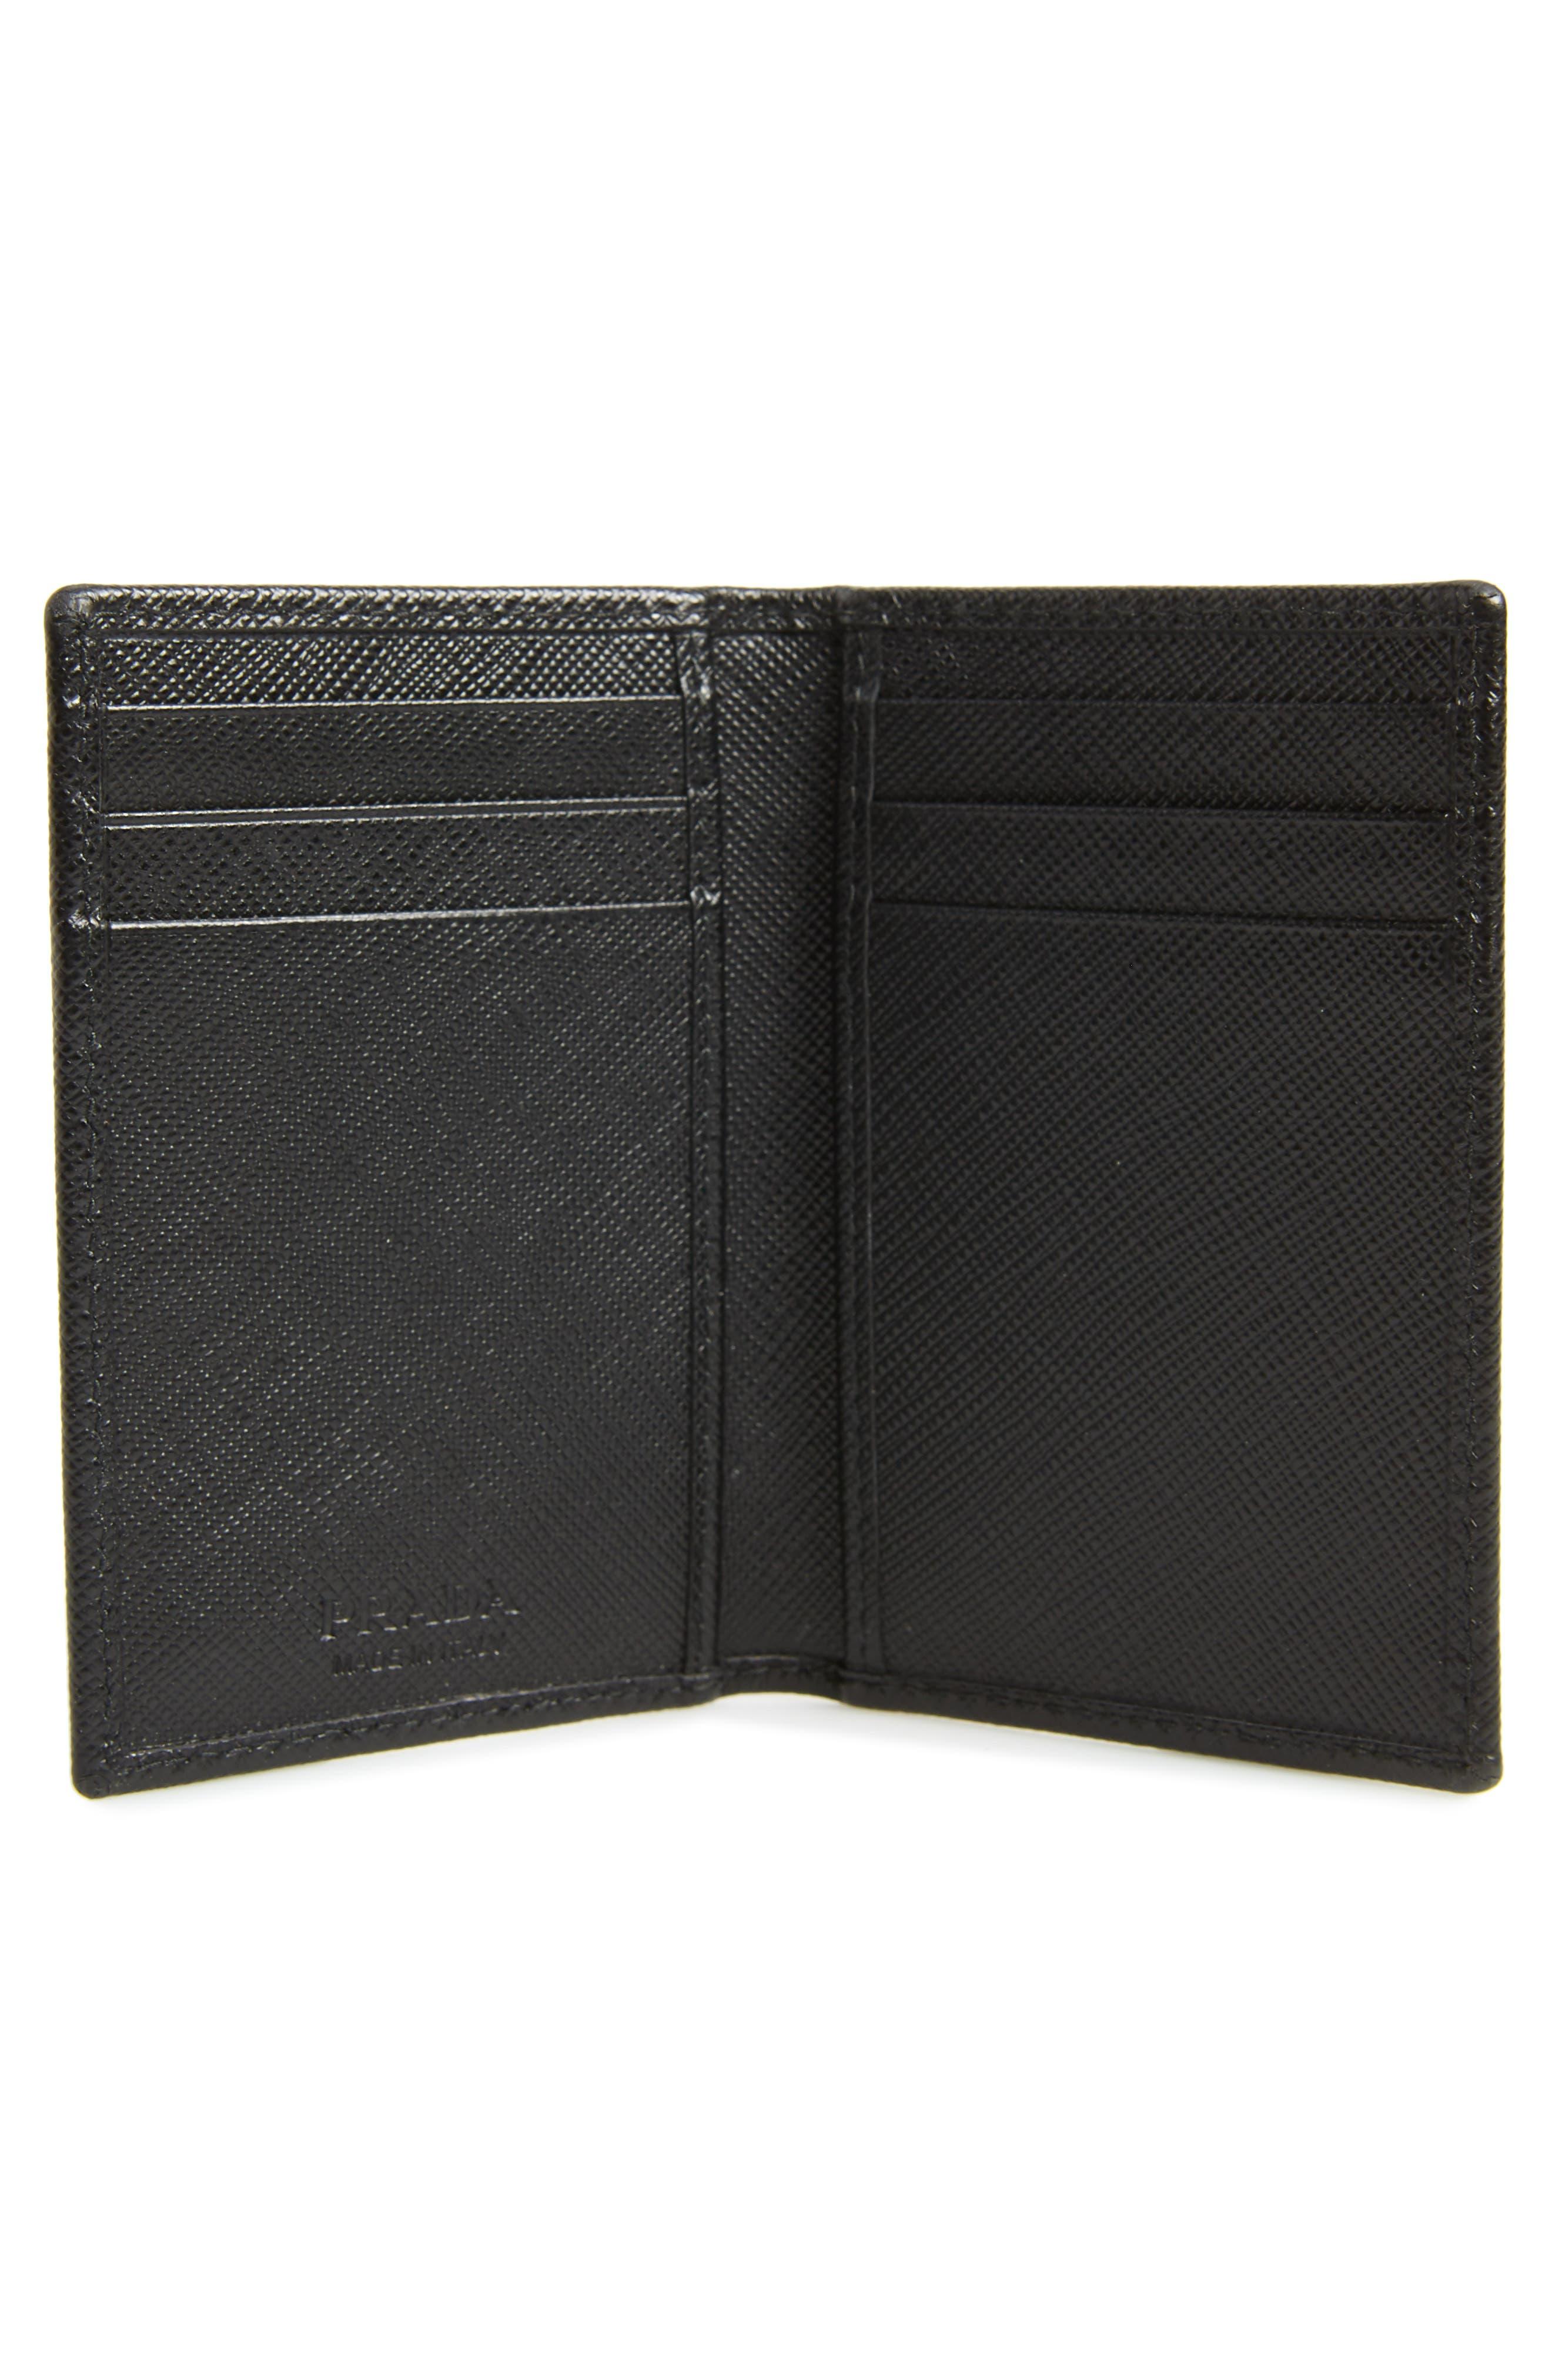 Long Saffiano Leather Card Case,                             Alternate thumbnail 2, color,                             001